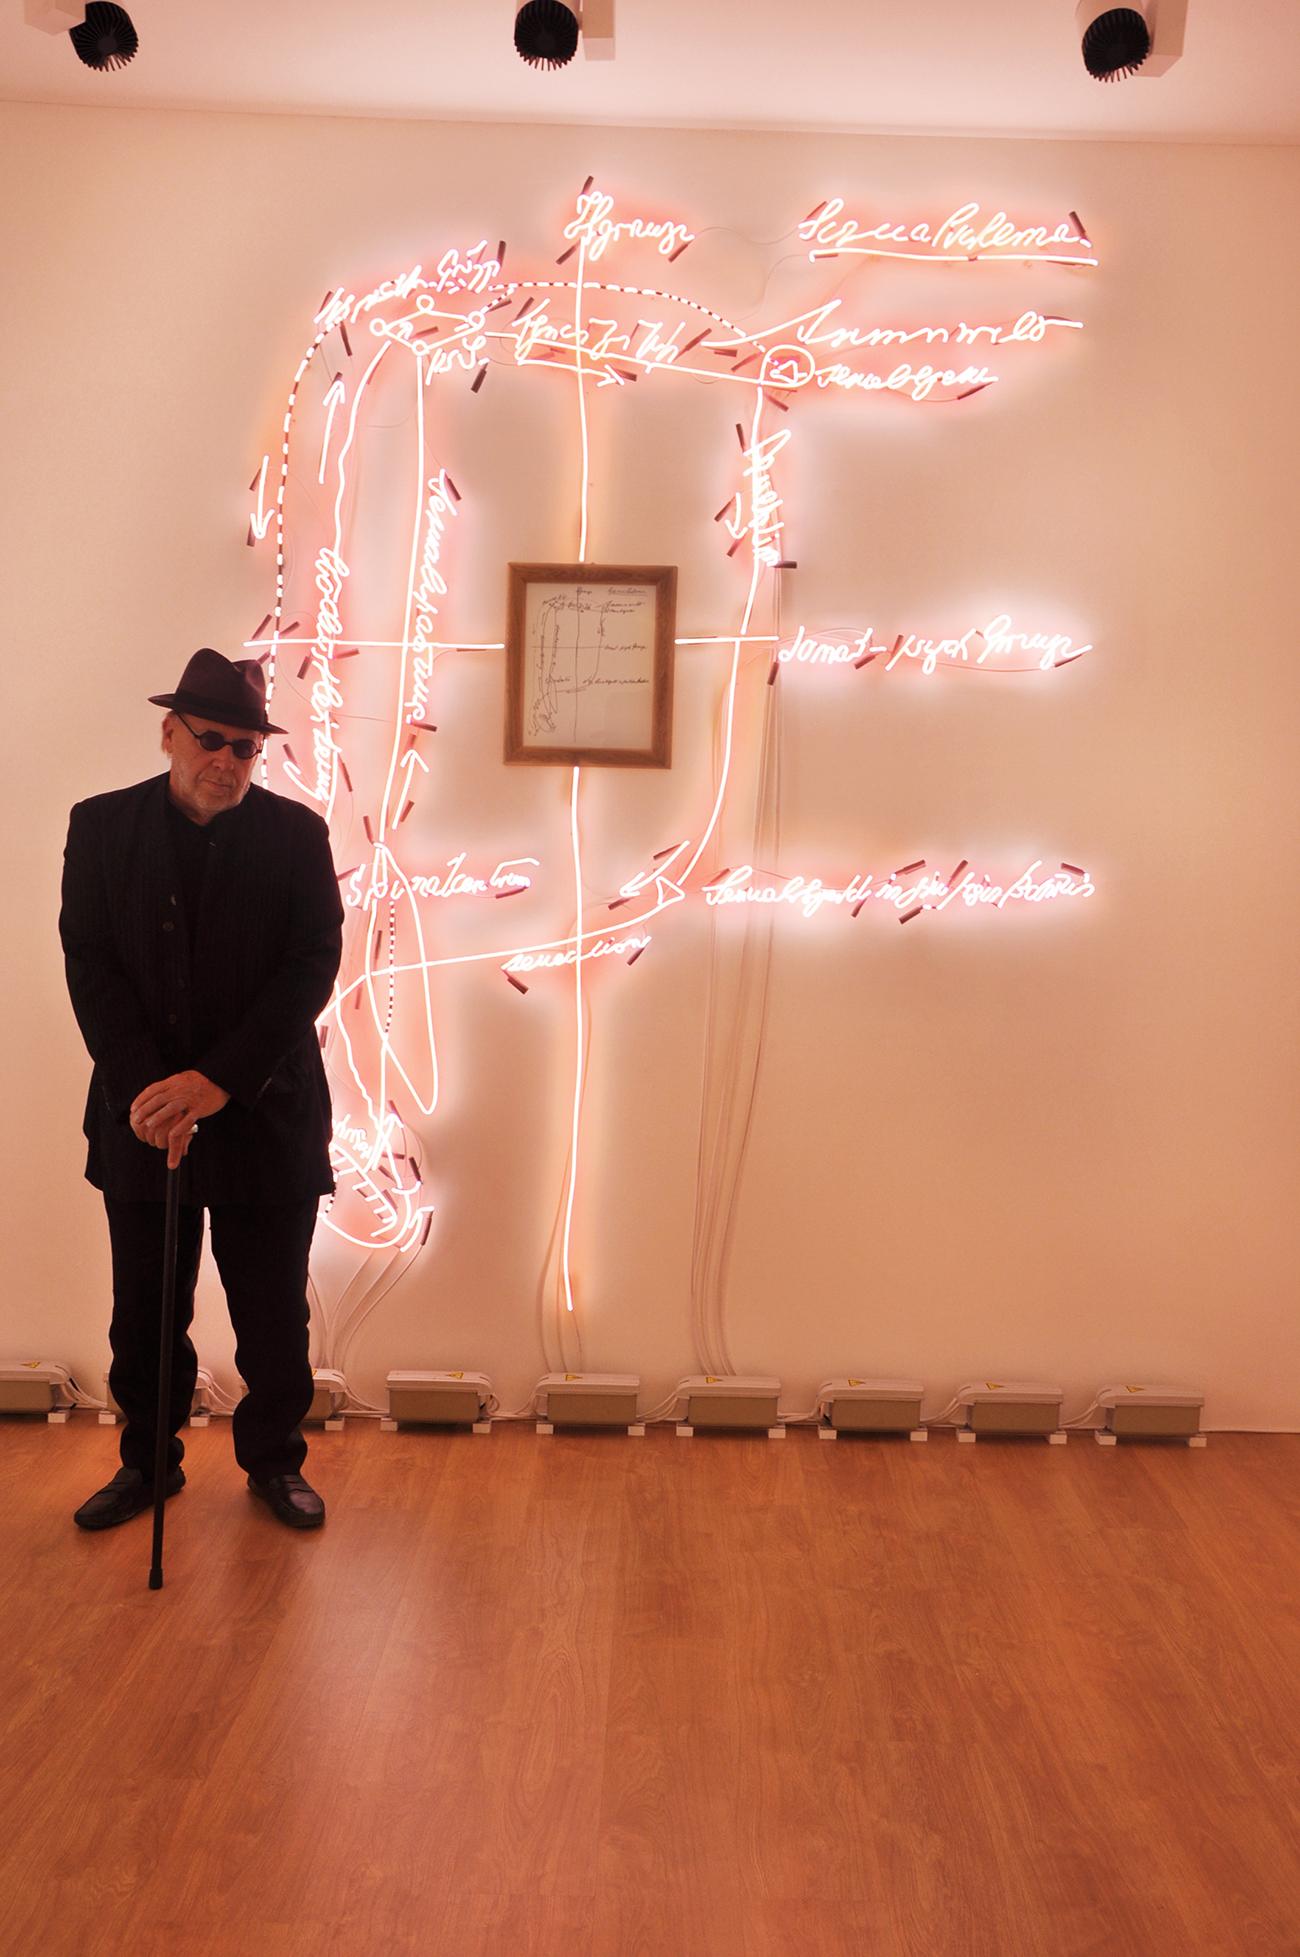 Joseph Kosuth, A Conditioning of Consciousness